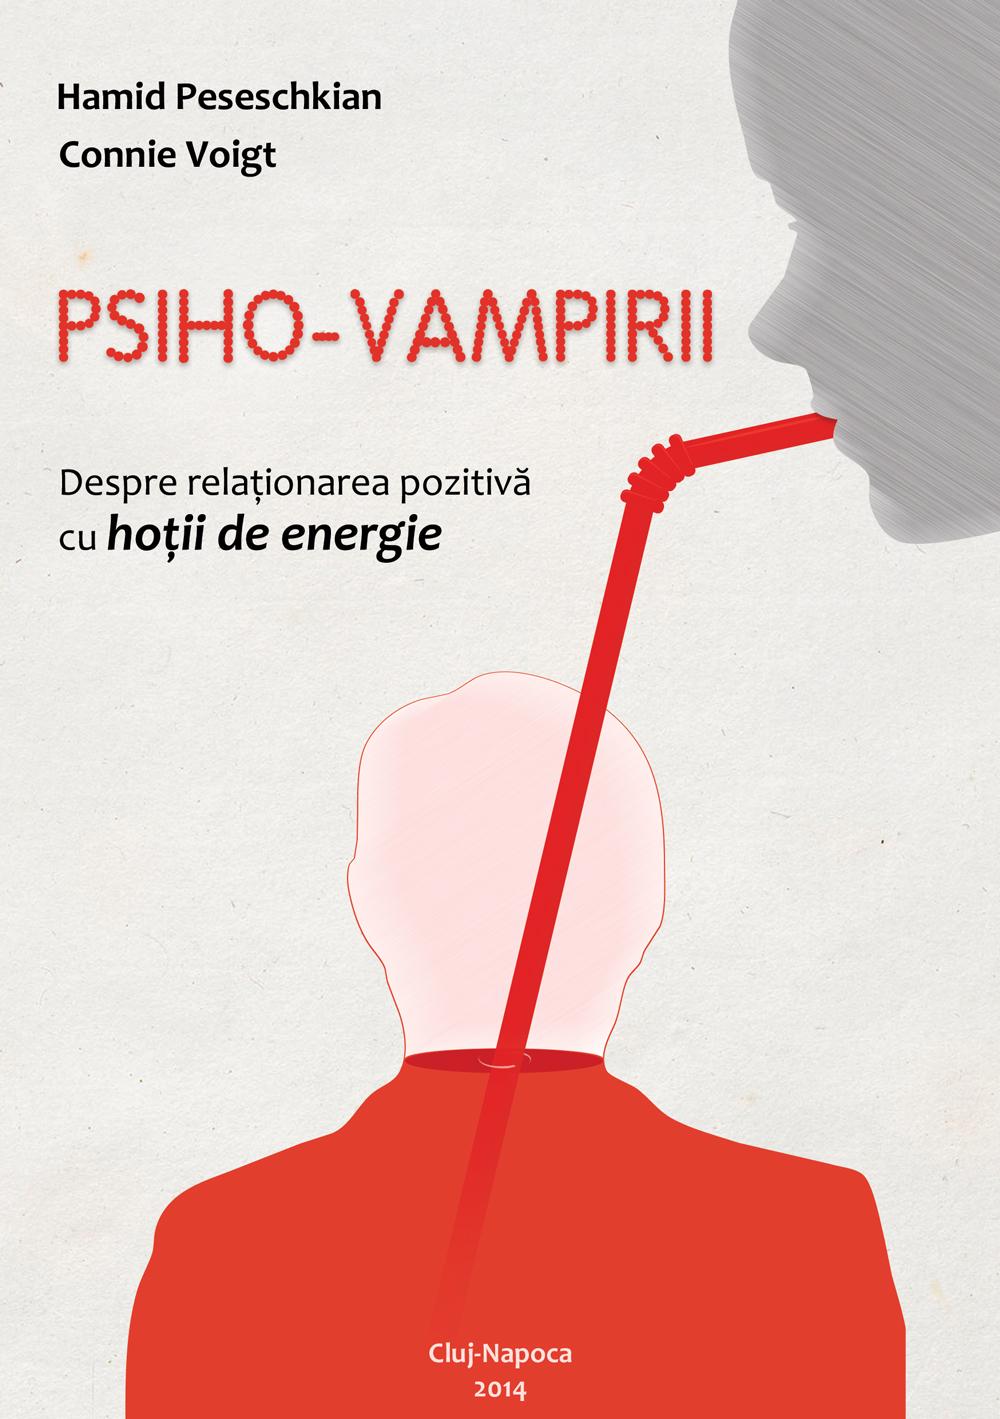 2014_Psiho-vampirii